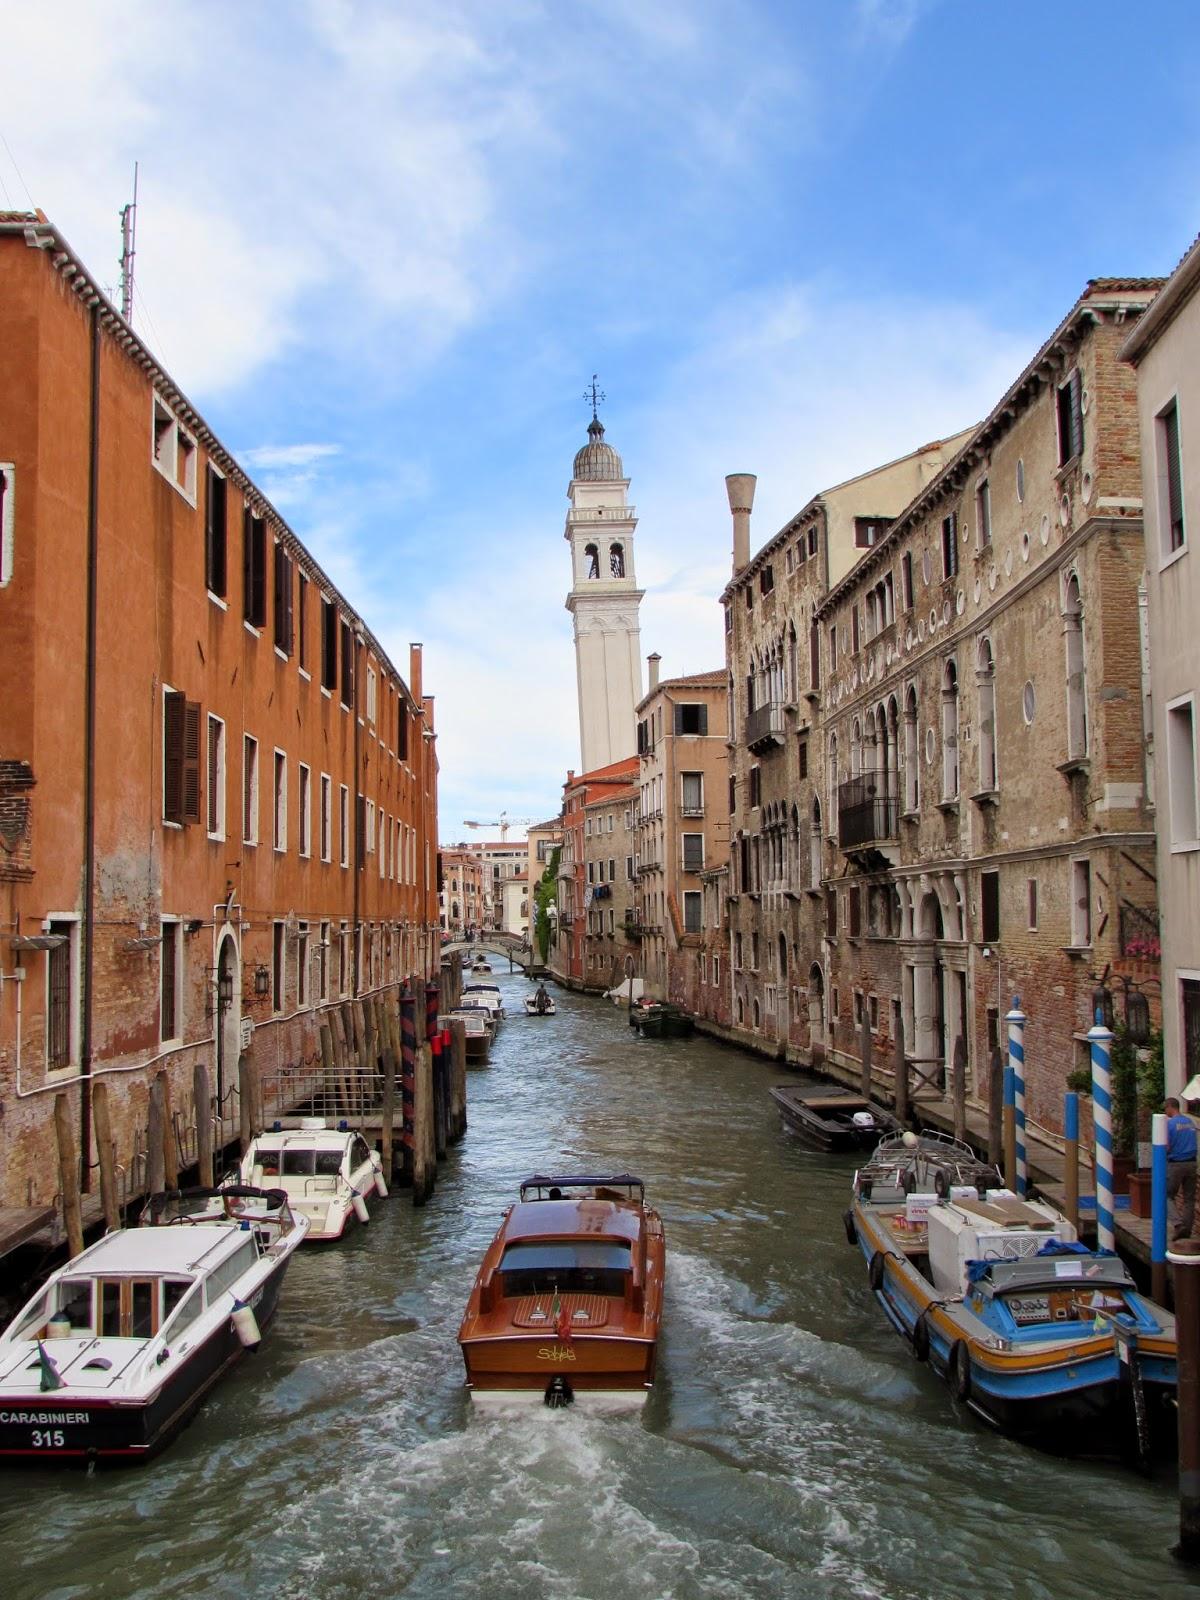 Jodi Bean\'s Blog: Italy Vacation: Venice (Canals, Bridges & Boats)